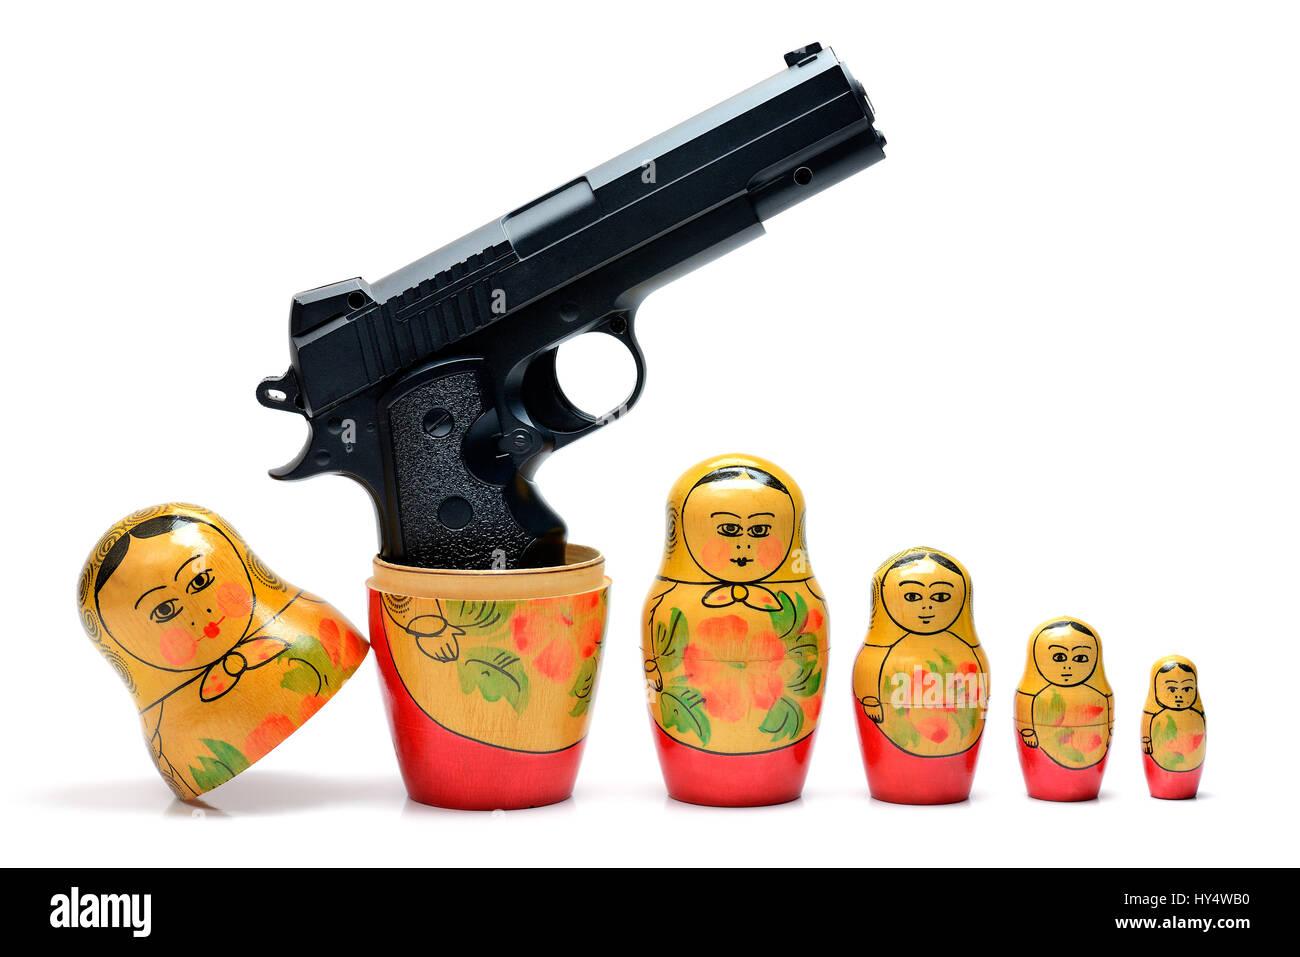 Russian Matroschka with gun, Russische Matroschka mit Pistole Stock Photo